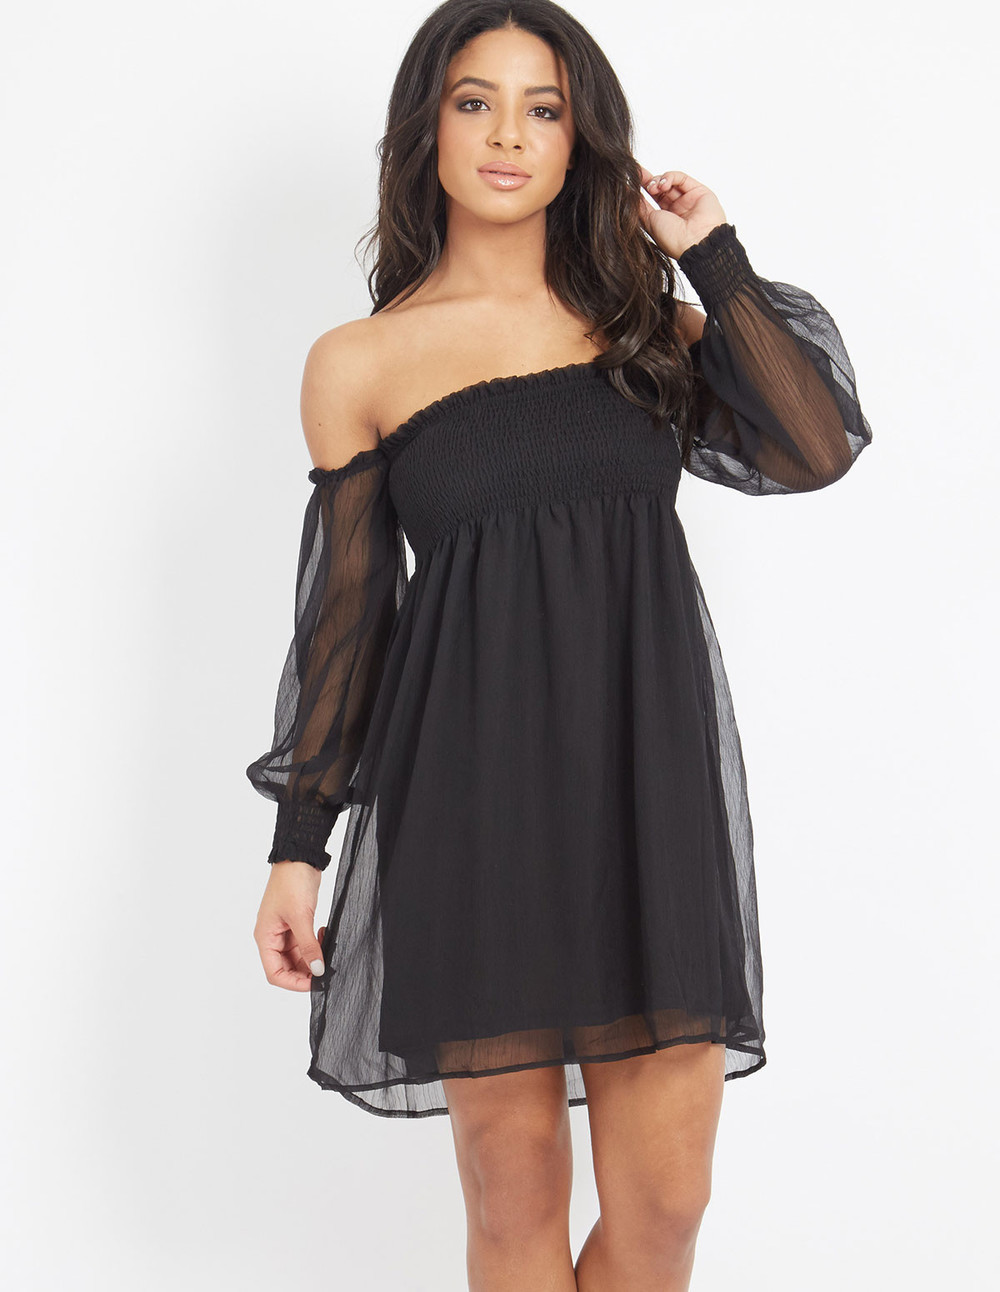 Blue Vanilla CARLOTTA - Bardot Chiffon Dress Black